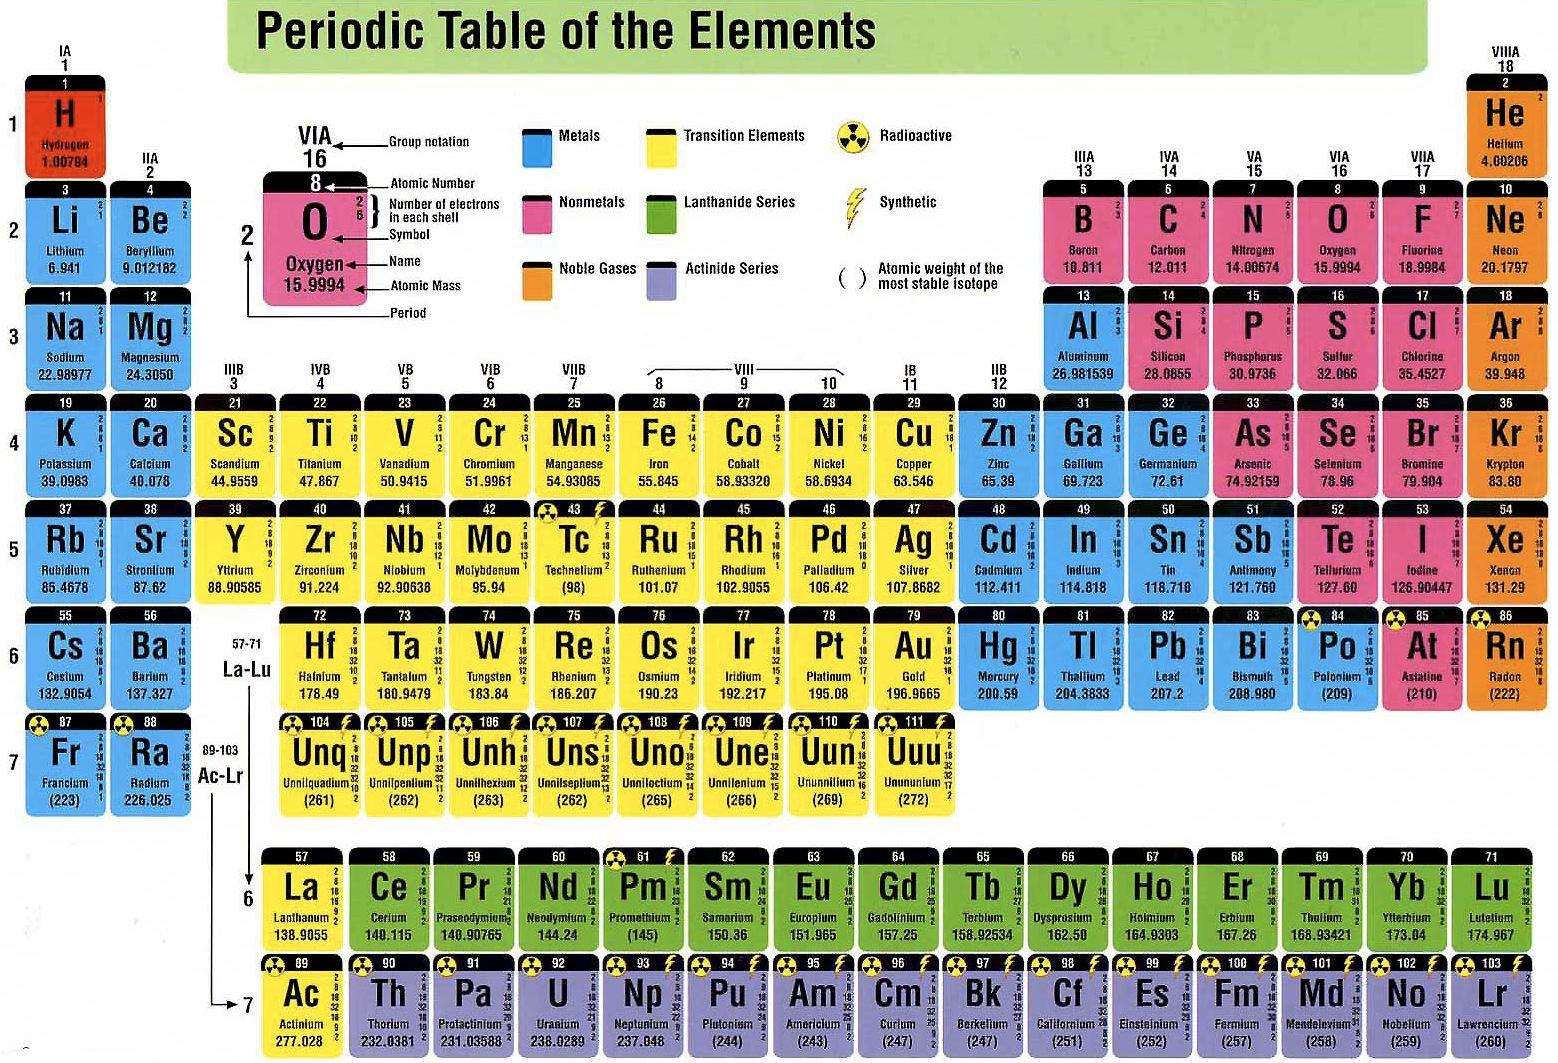 Arsenic Periodic Table Family Name